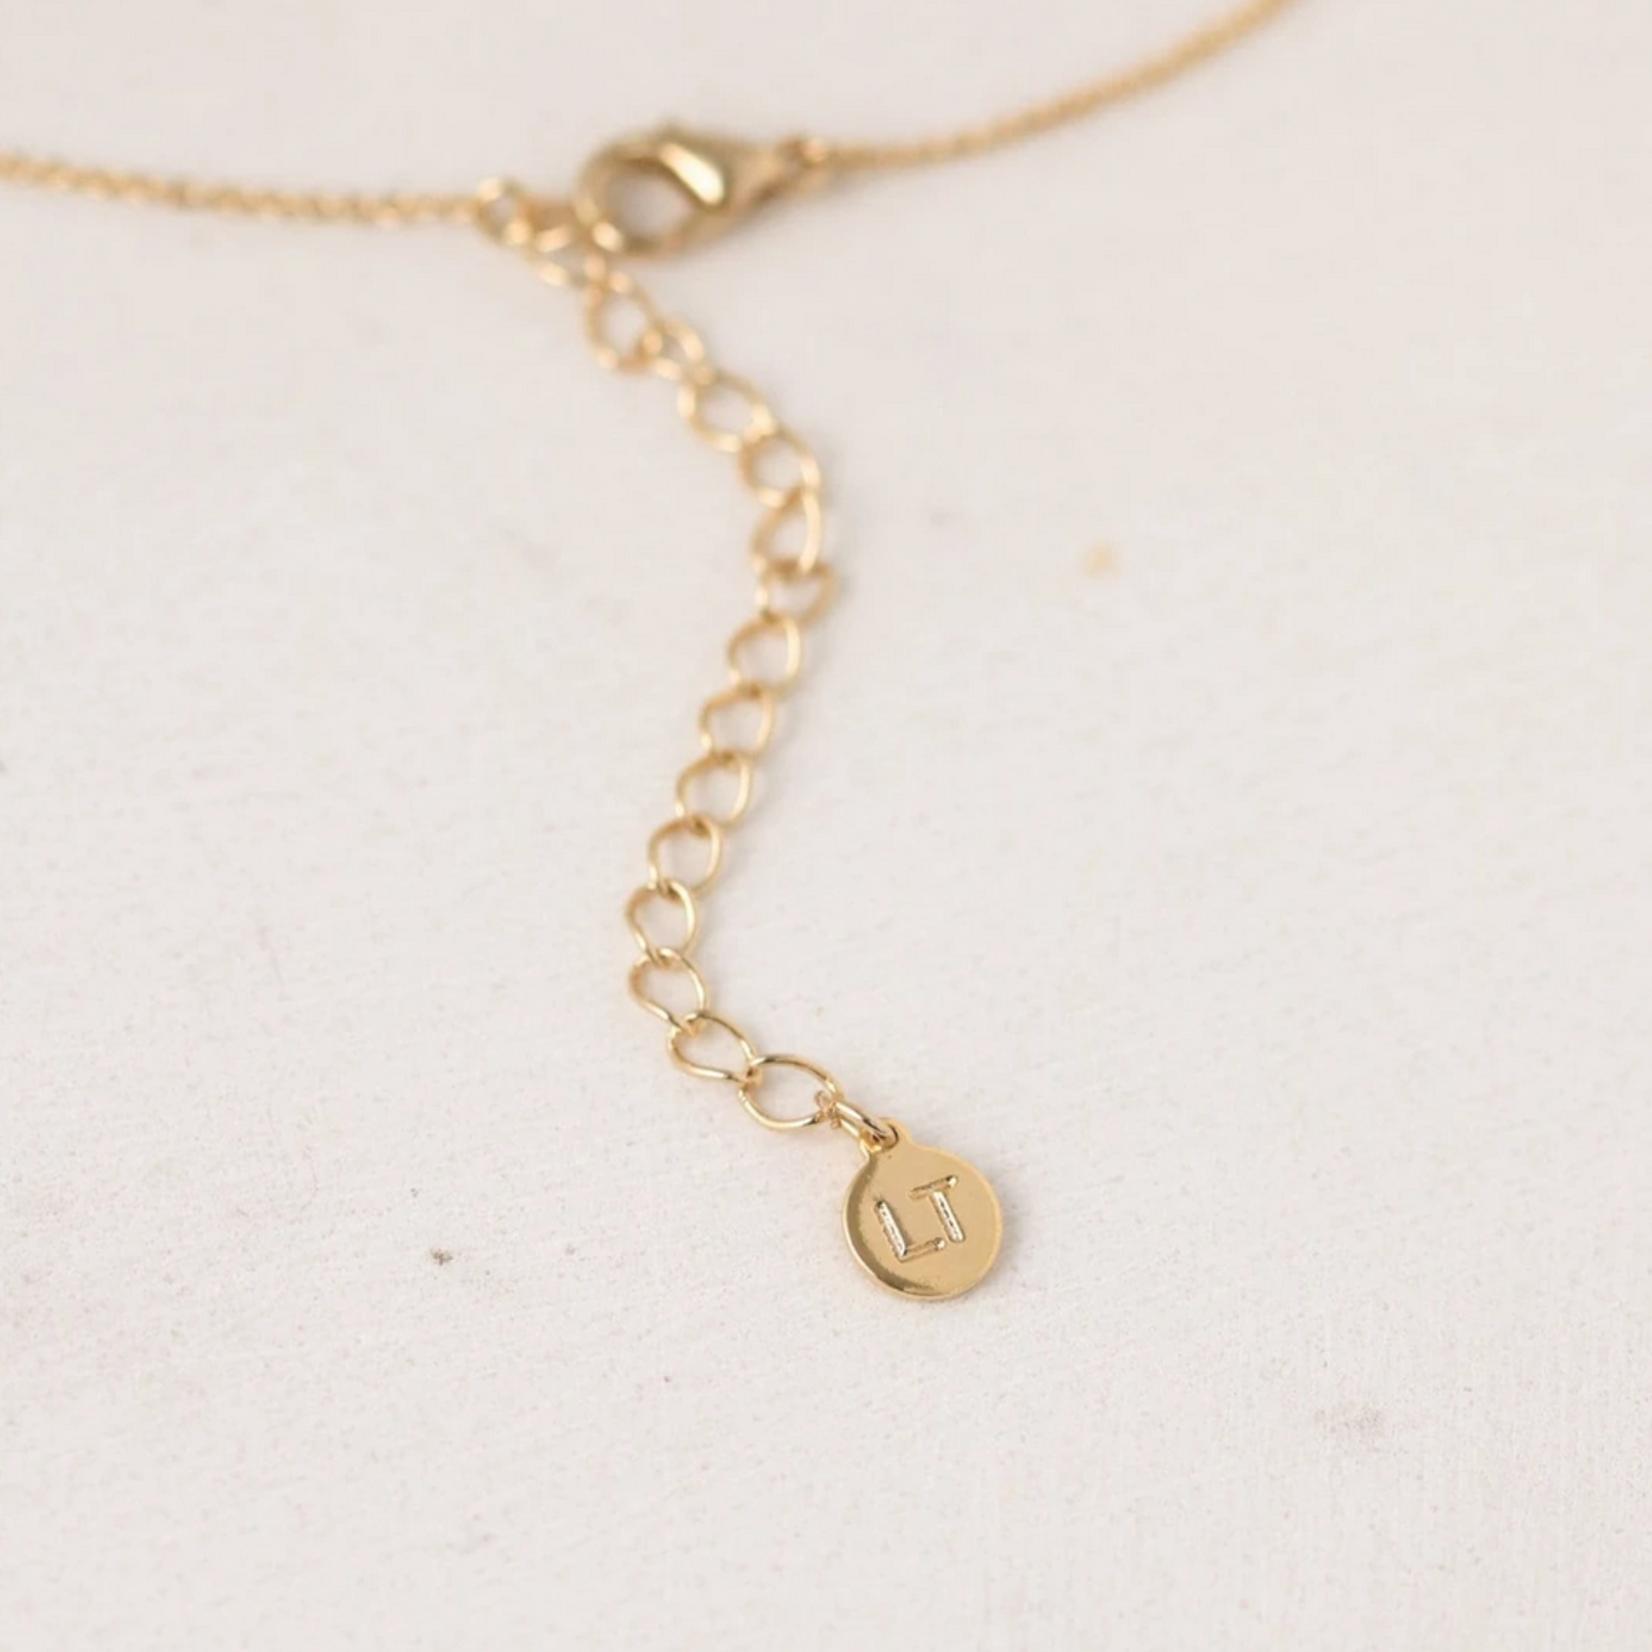 December Kaleidoscope Birthstone Necklace-Gold